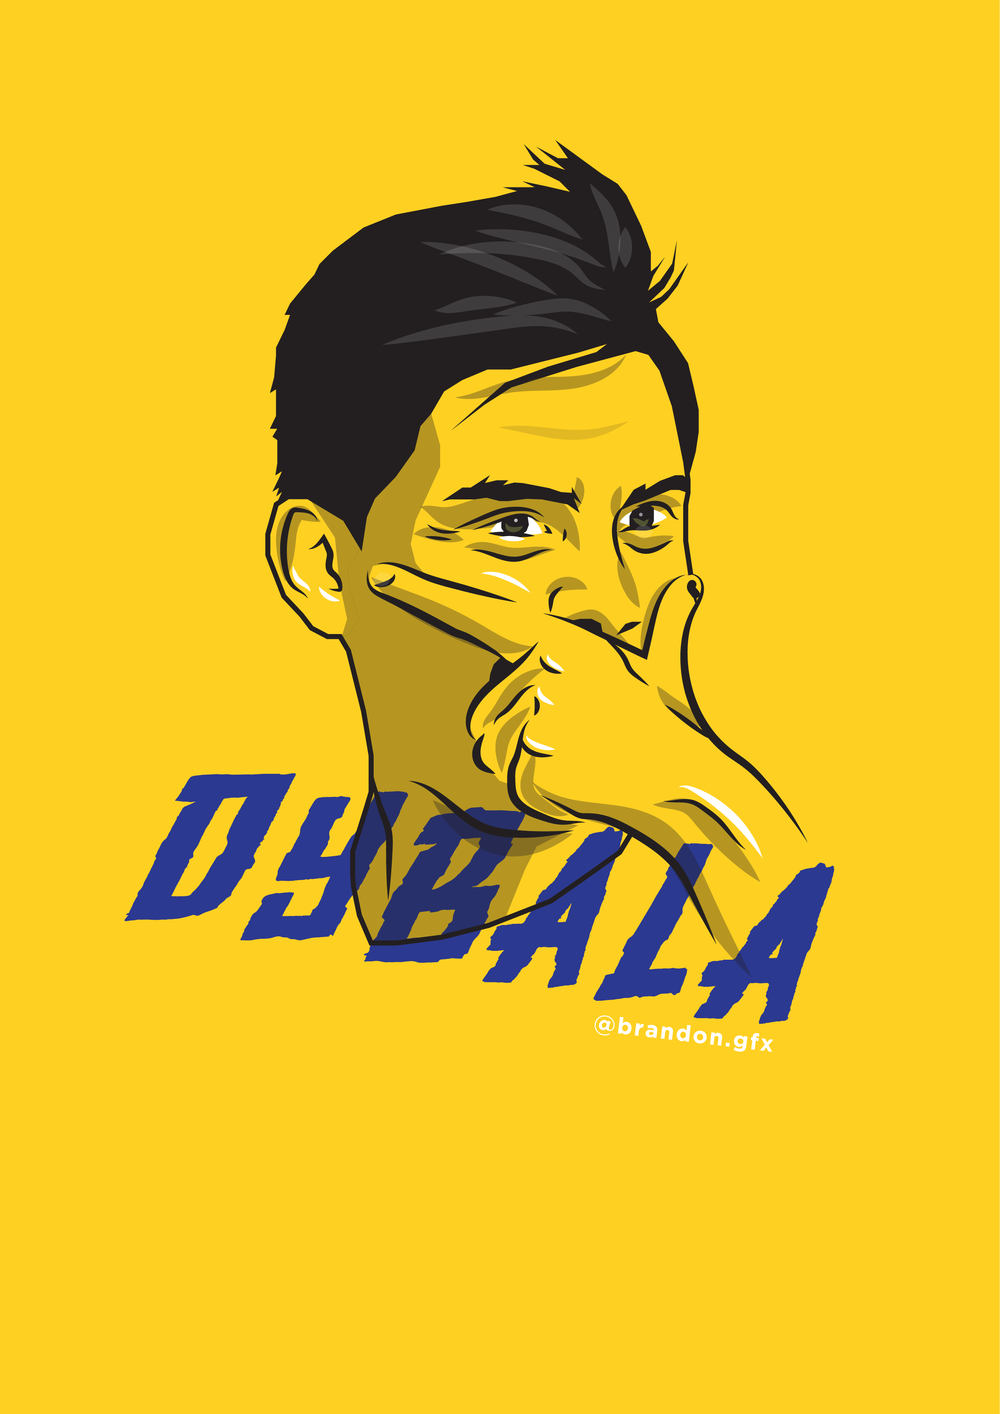 dybala-01.png